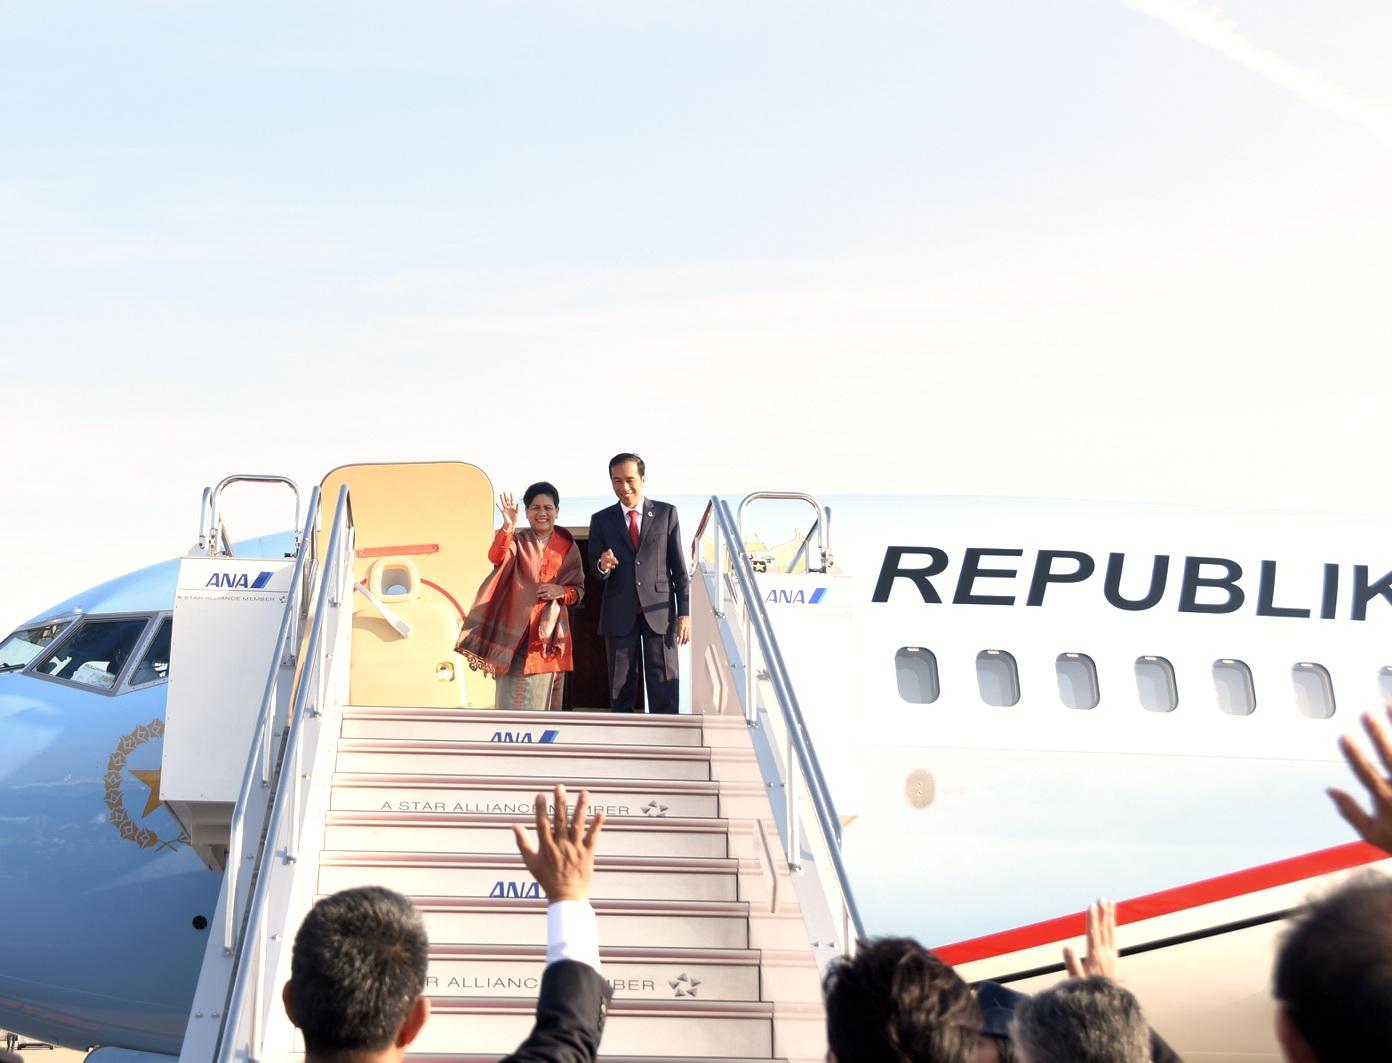 President Joko 'Jokowi' Widodo and First Lady Ibu Iriana Joko Widodo take off to Ambon to attend the Peak Commemoration of the 2017 National Press Day, in Ambon, Maluku, Thursday (9/2) morning.